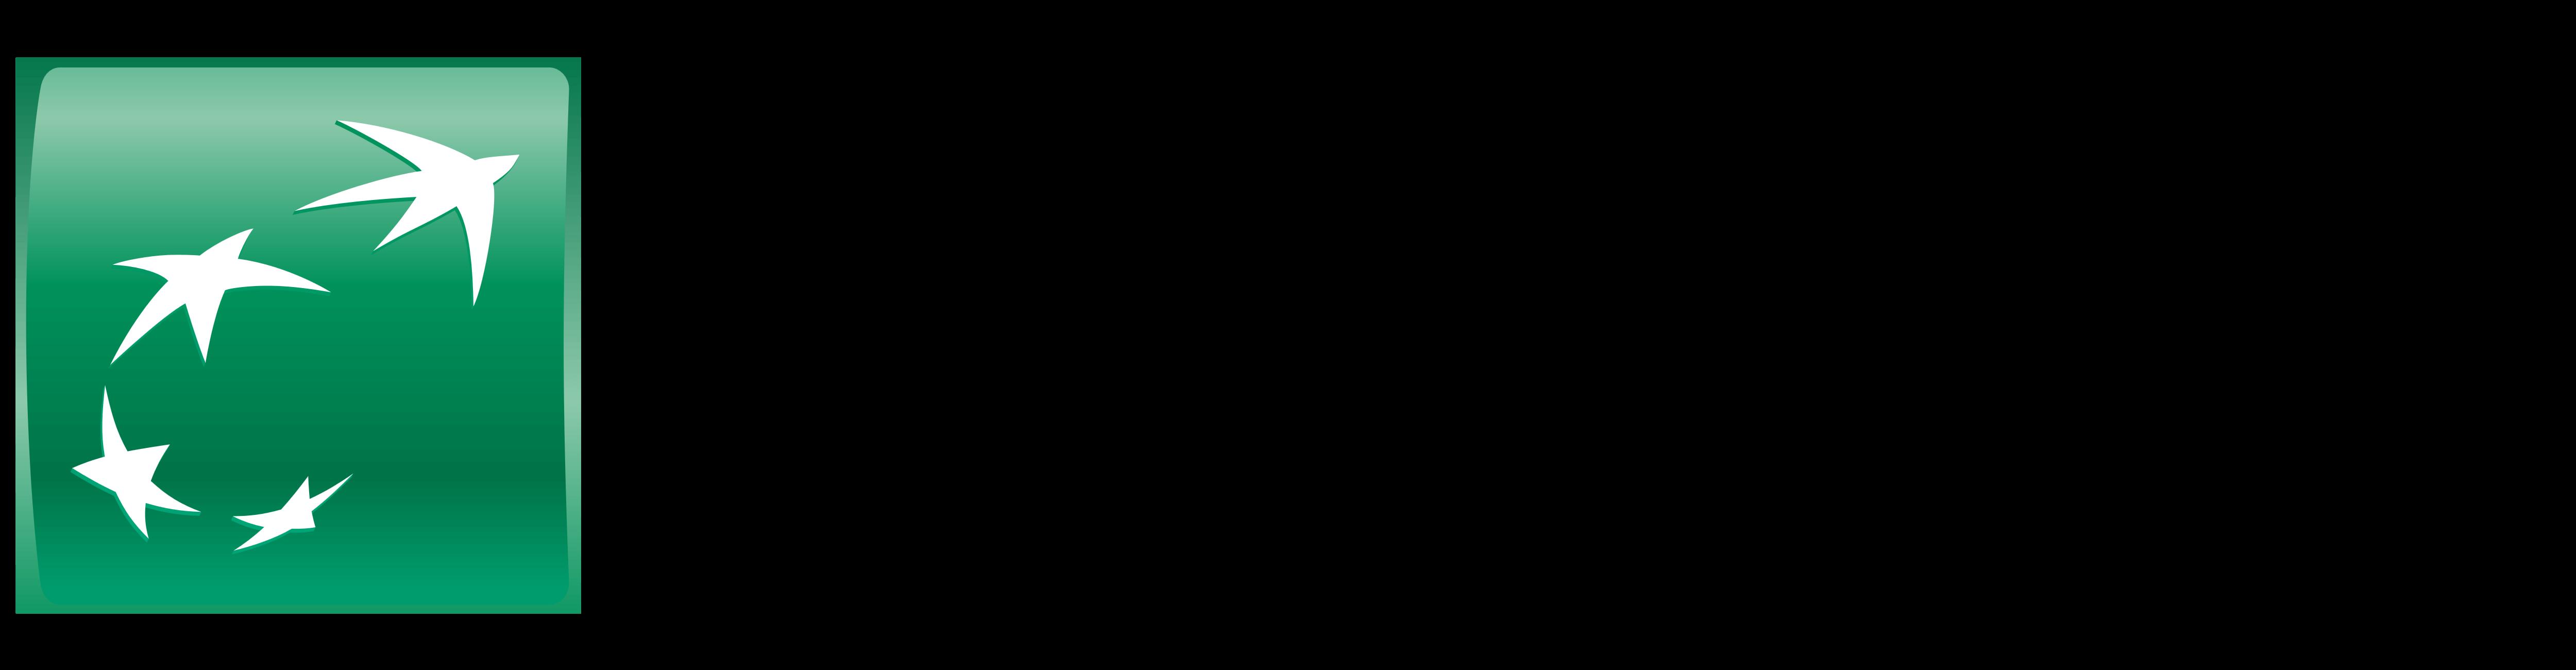 https://exportpulse.com/wp-content/uploads/2021/05/BNP-logo.png